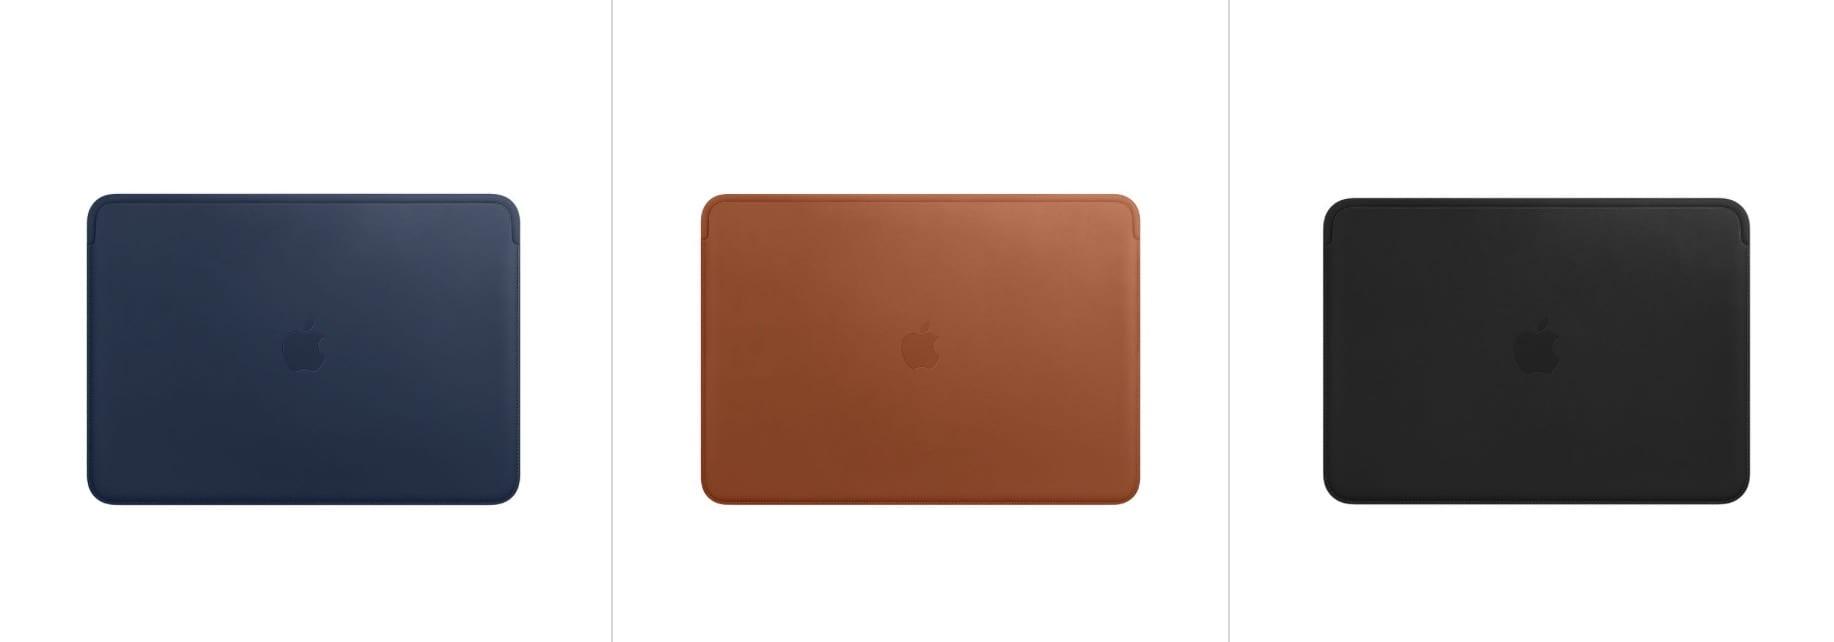 MacBook Pro leather sleeve